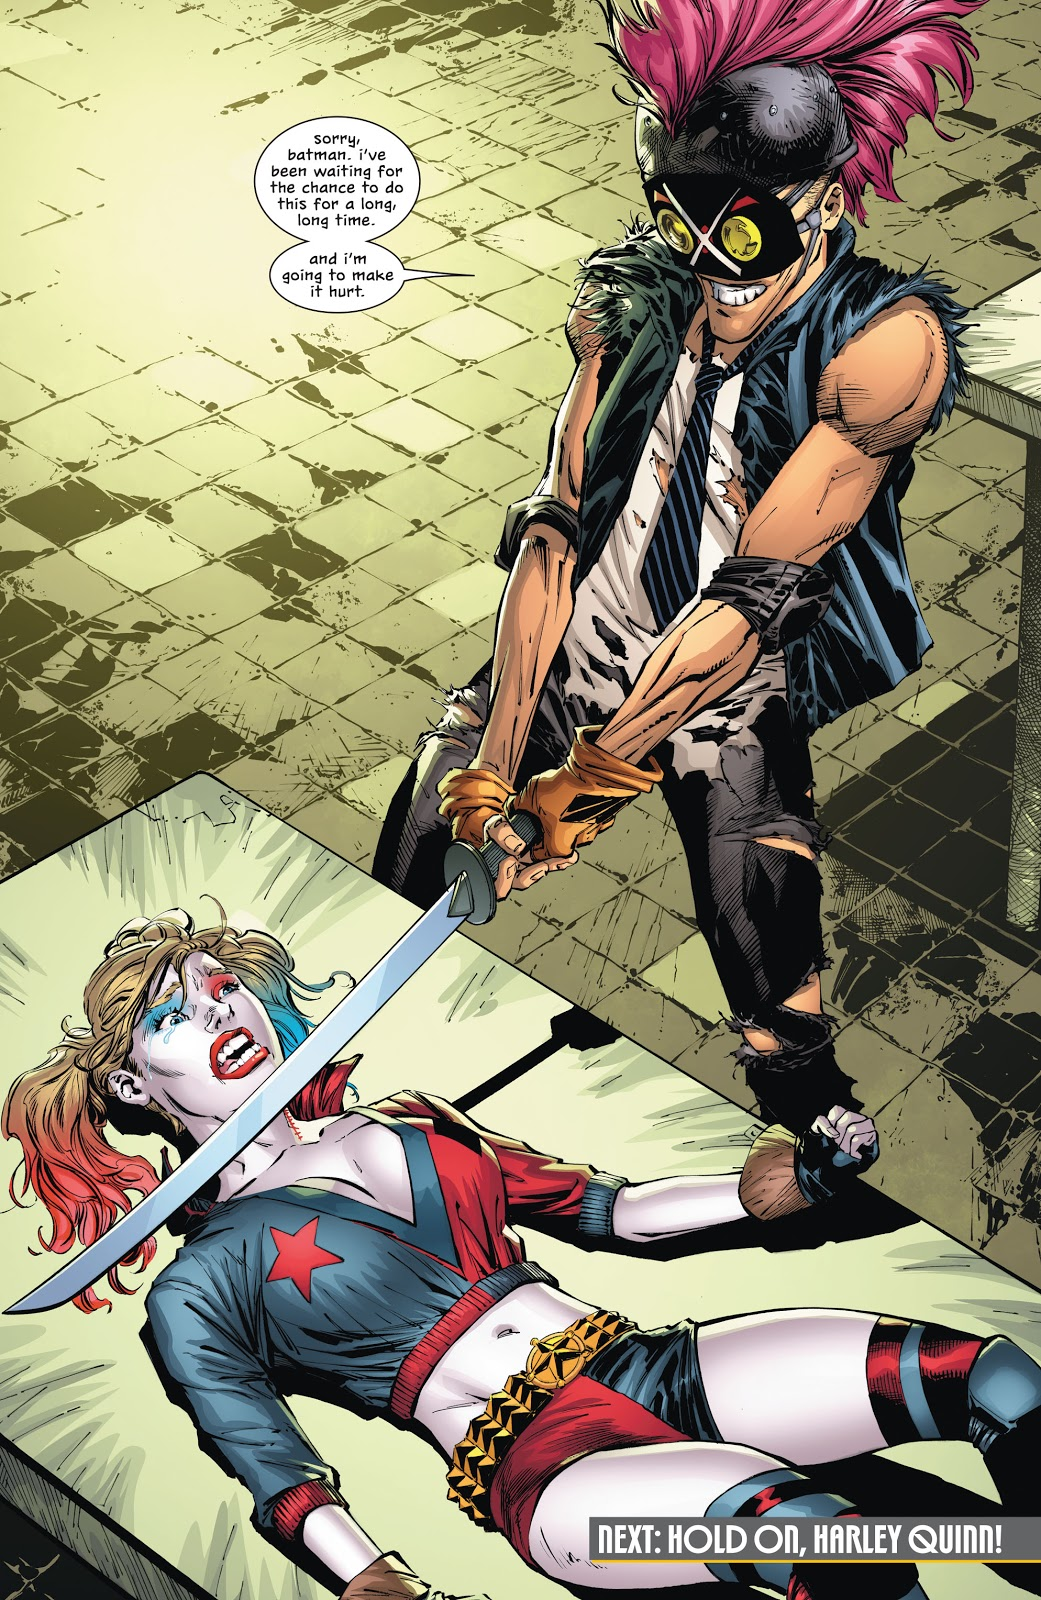 Clownhunter (Batman Vol. 3 #104)